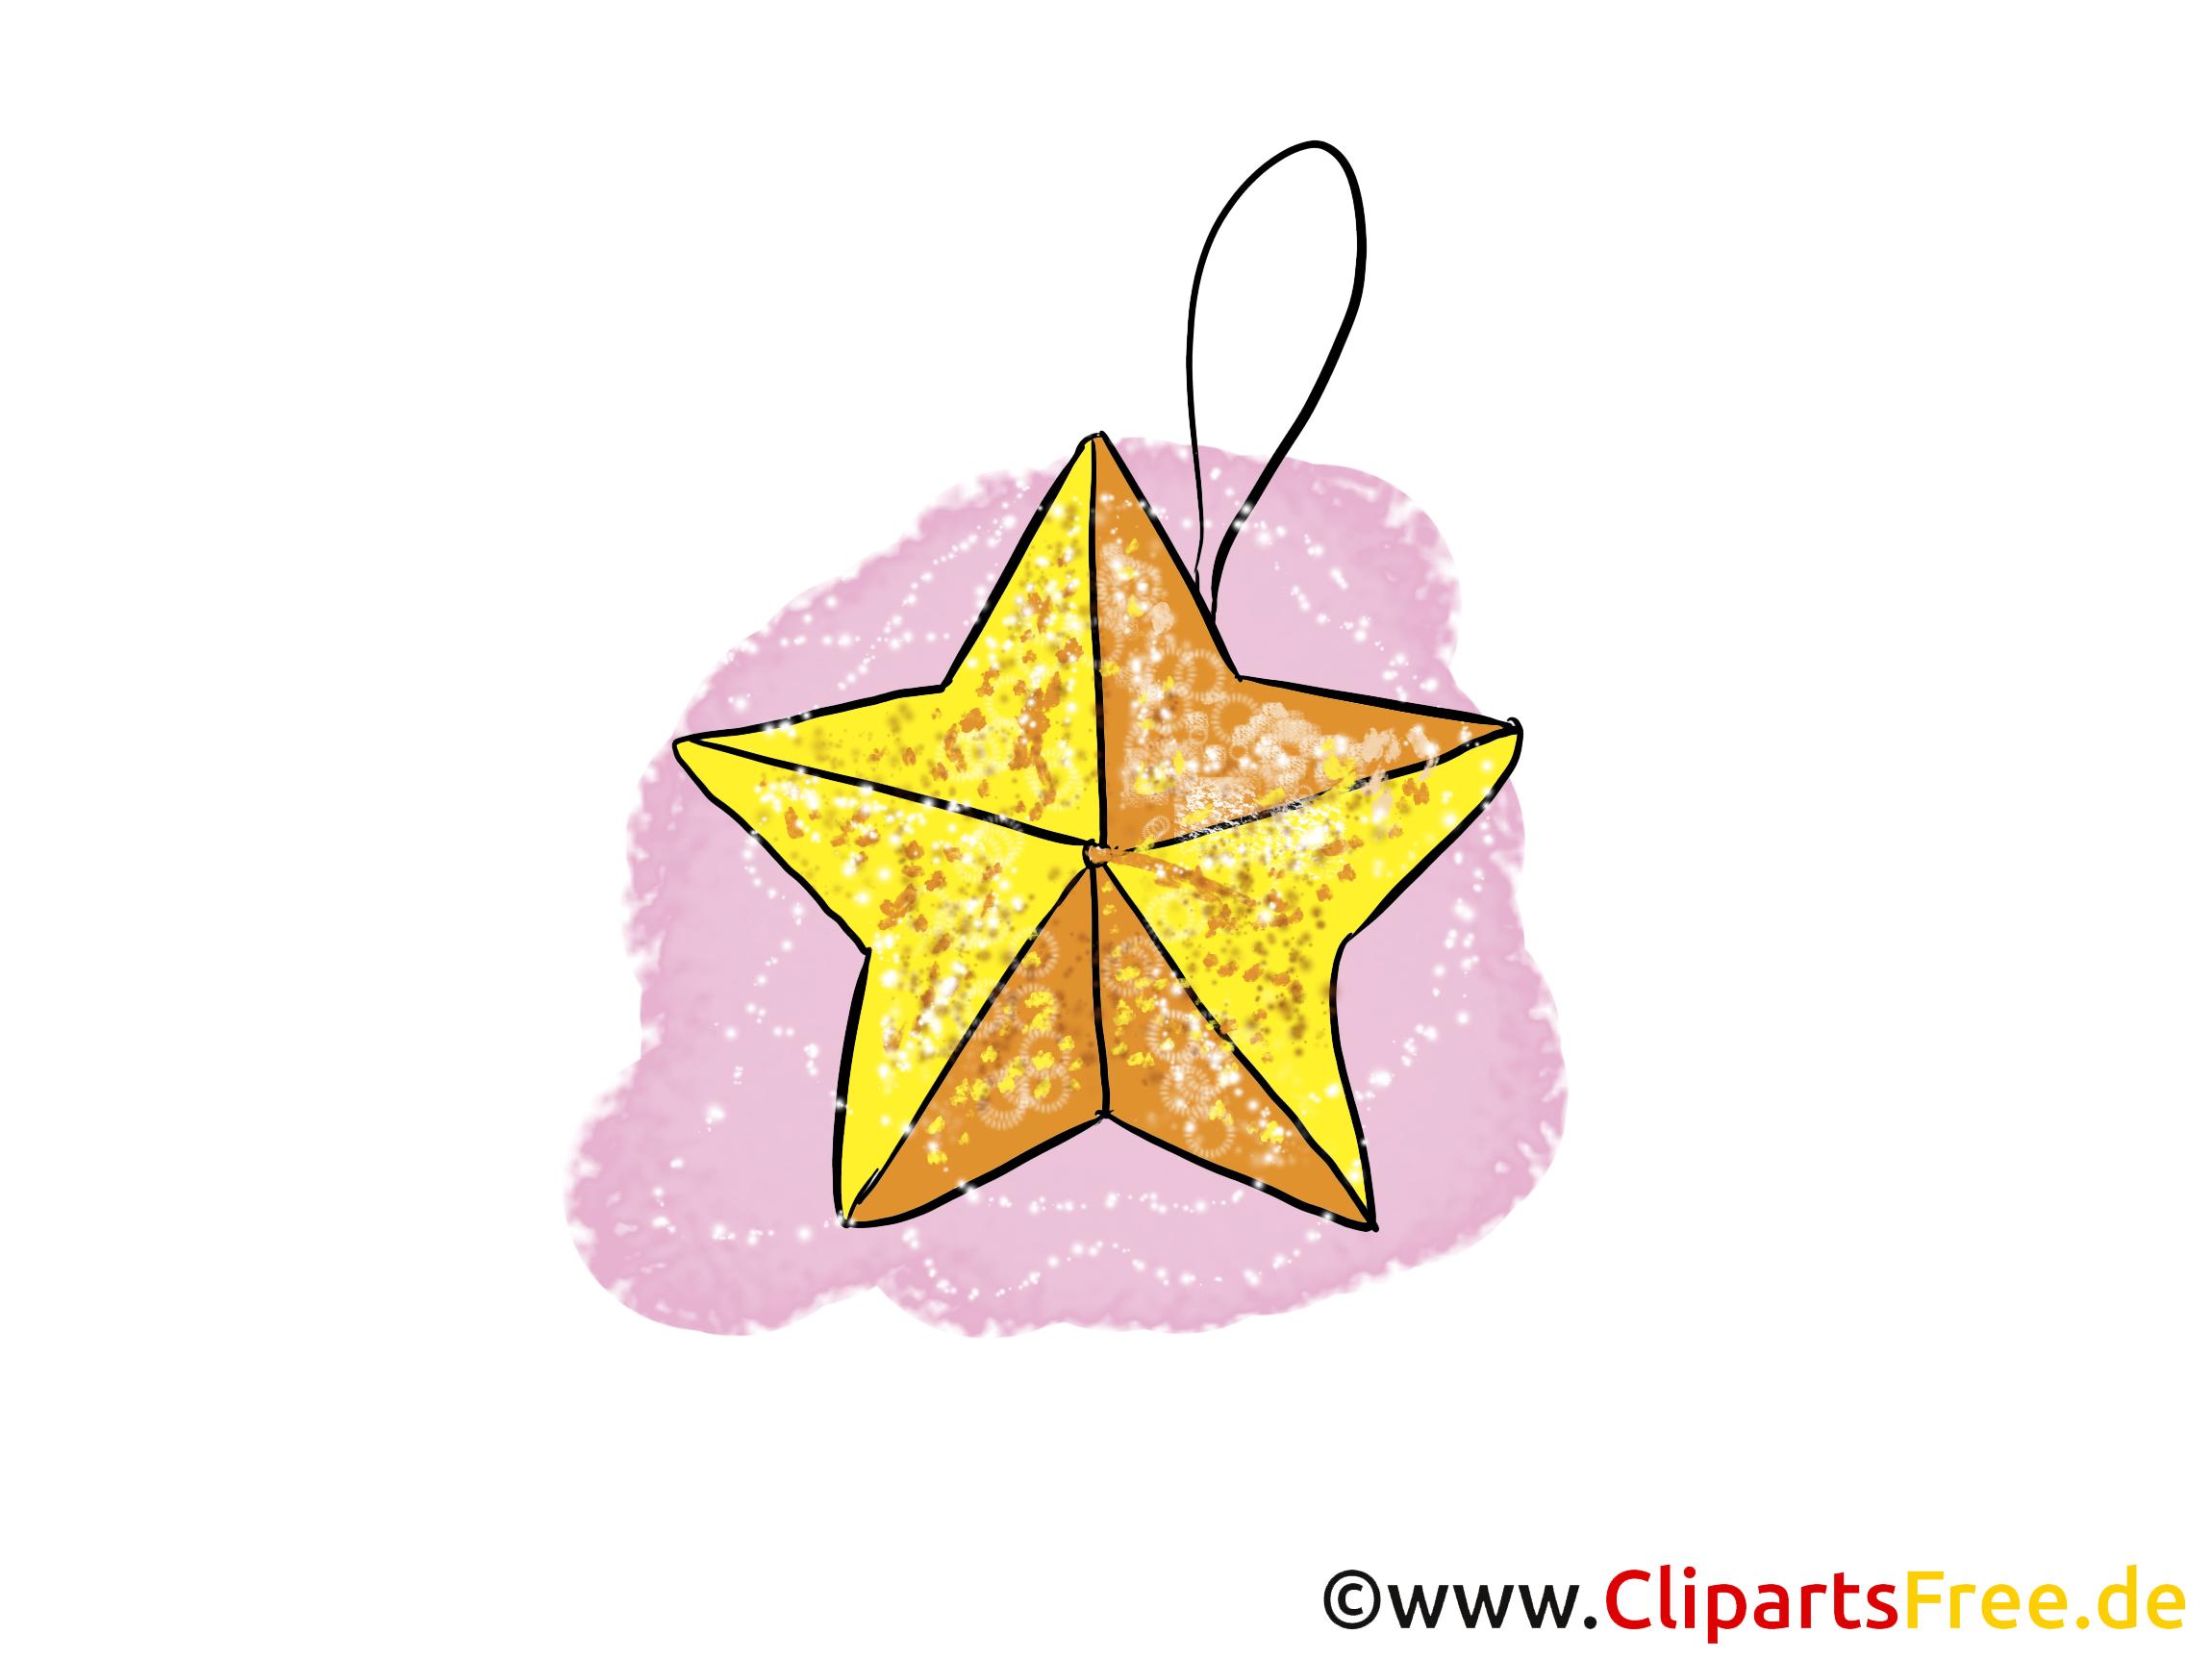 Star wenskaart, clipart, foto, cartoon gratis